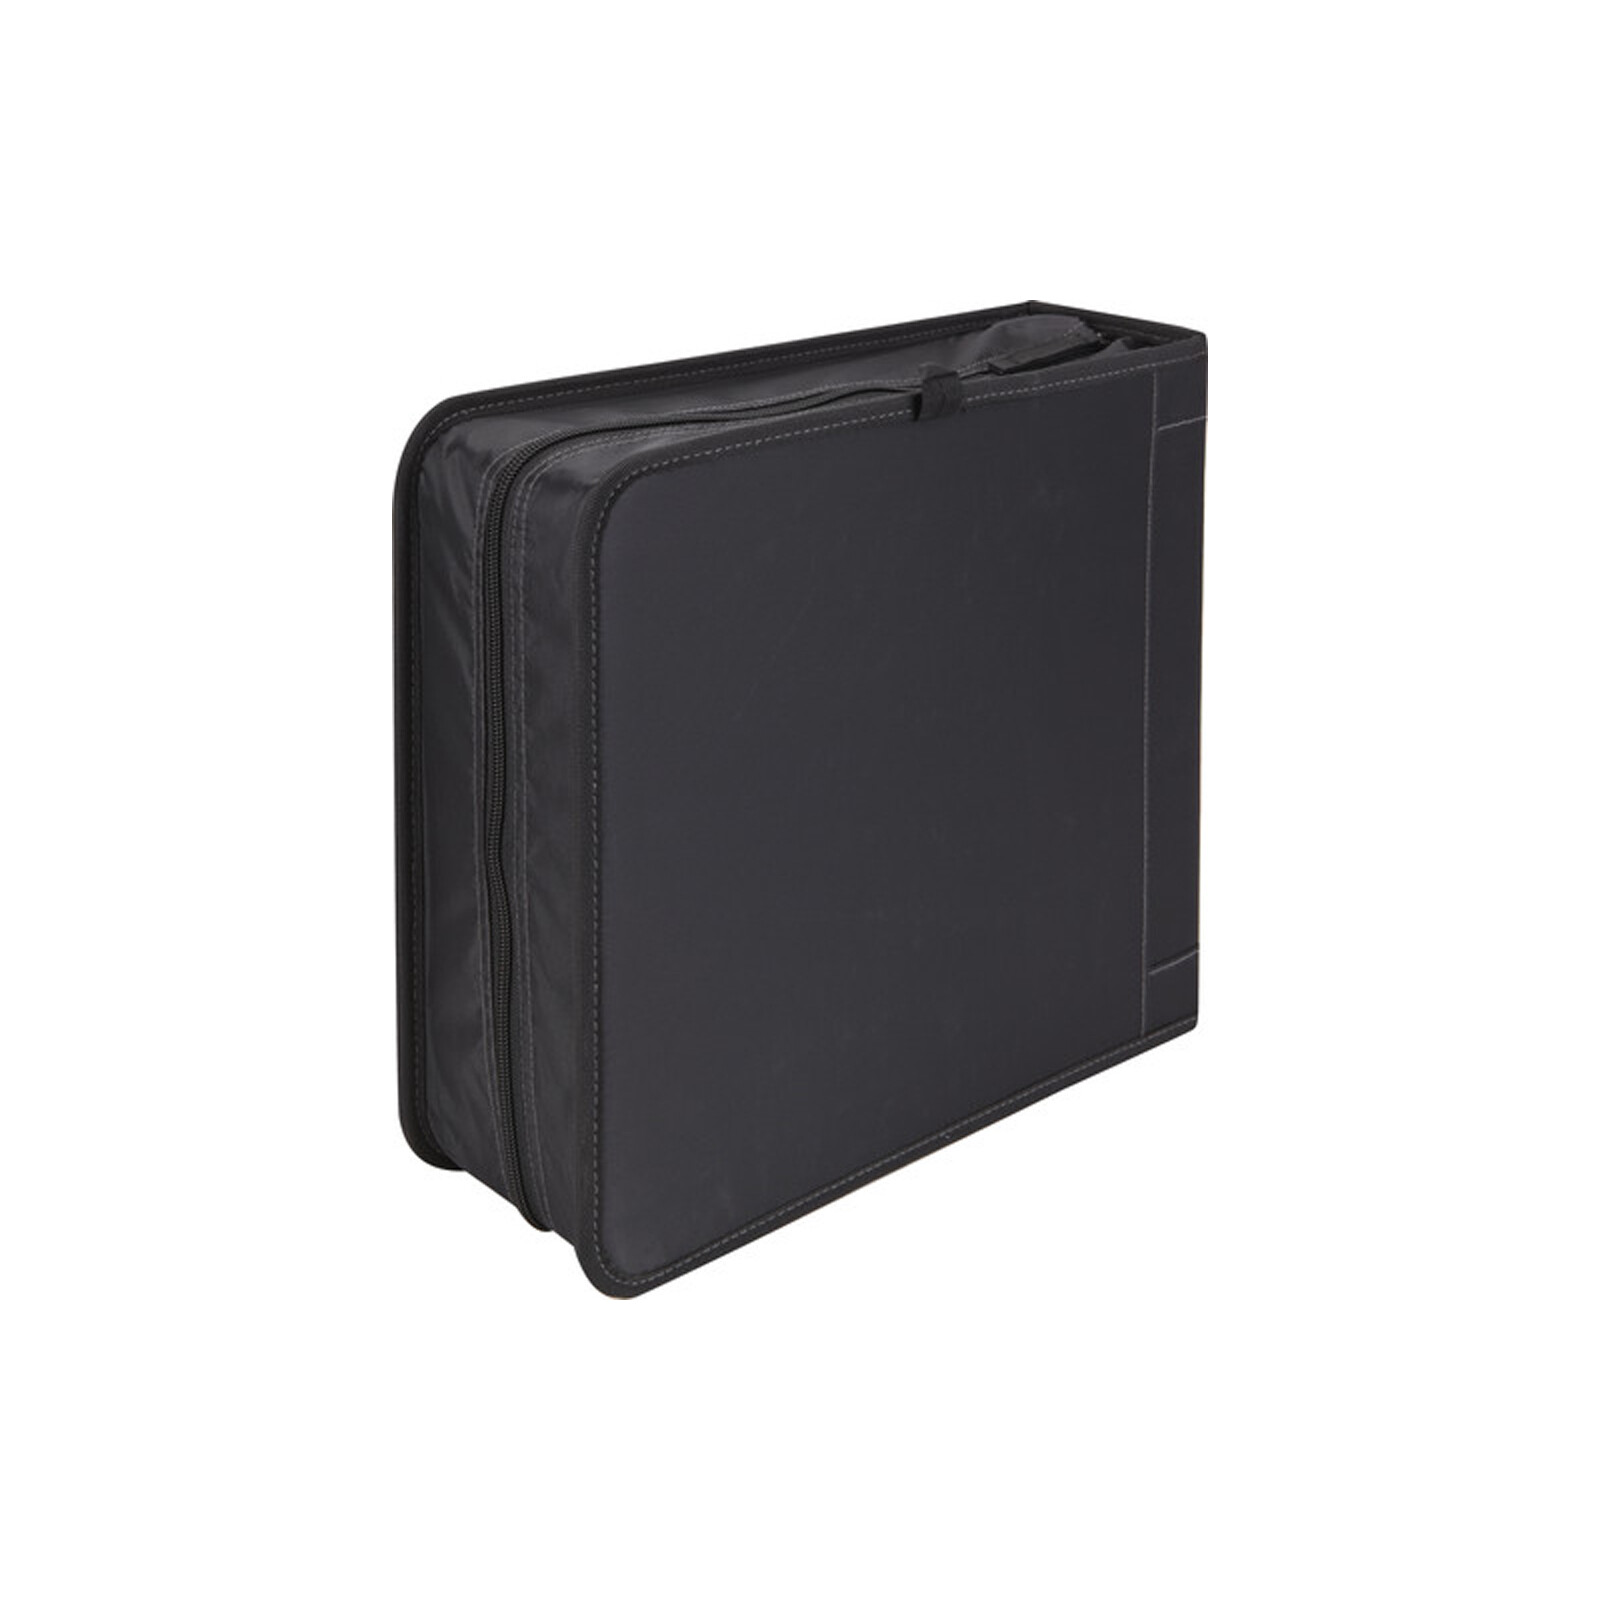 CaseLogic CD Wallet 208+16X 4-UP